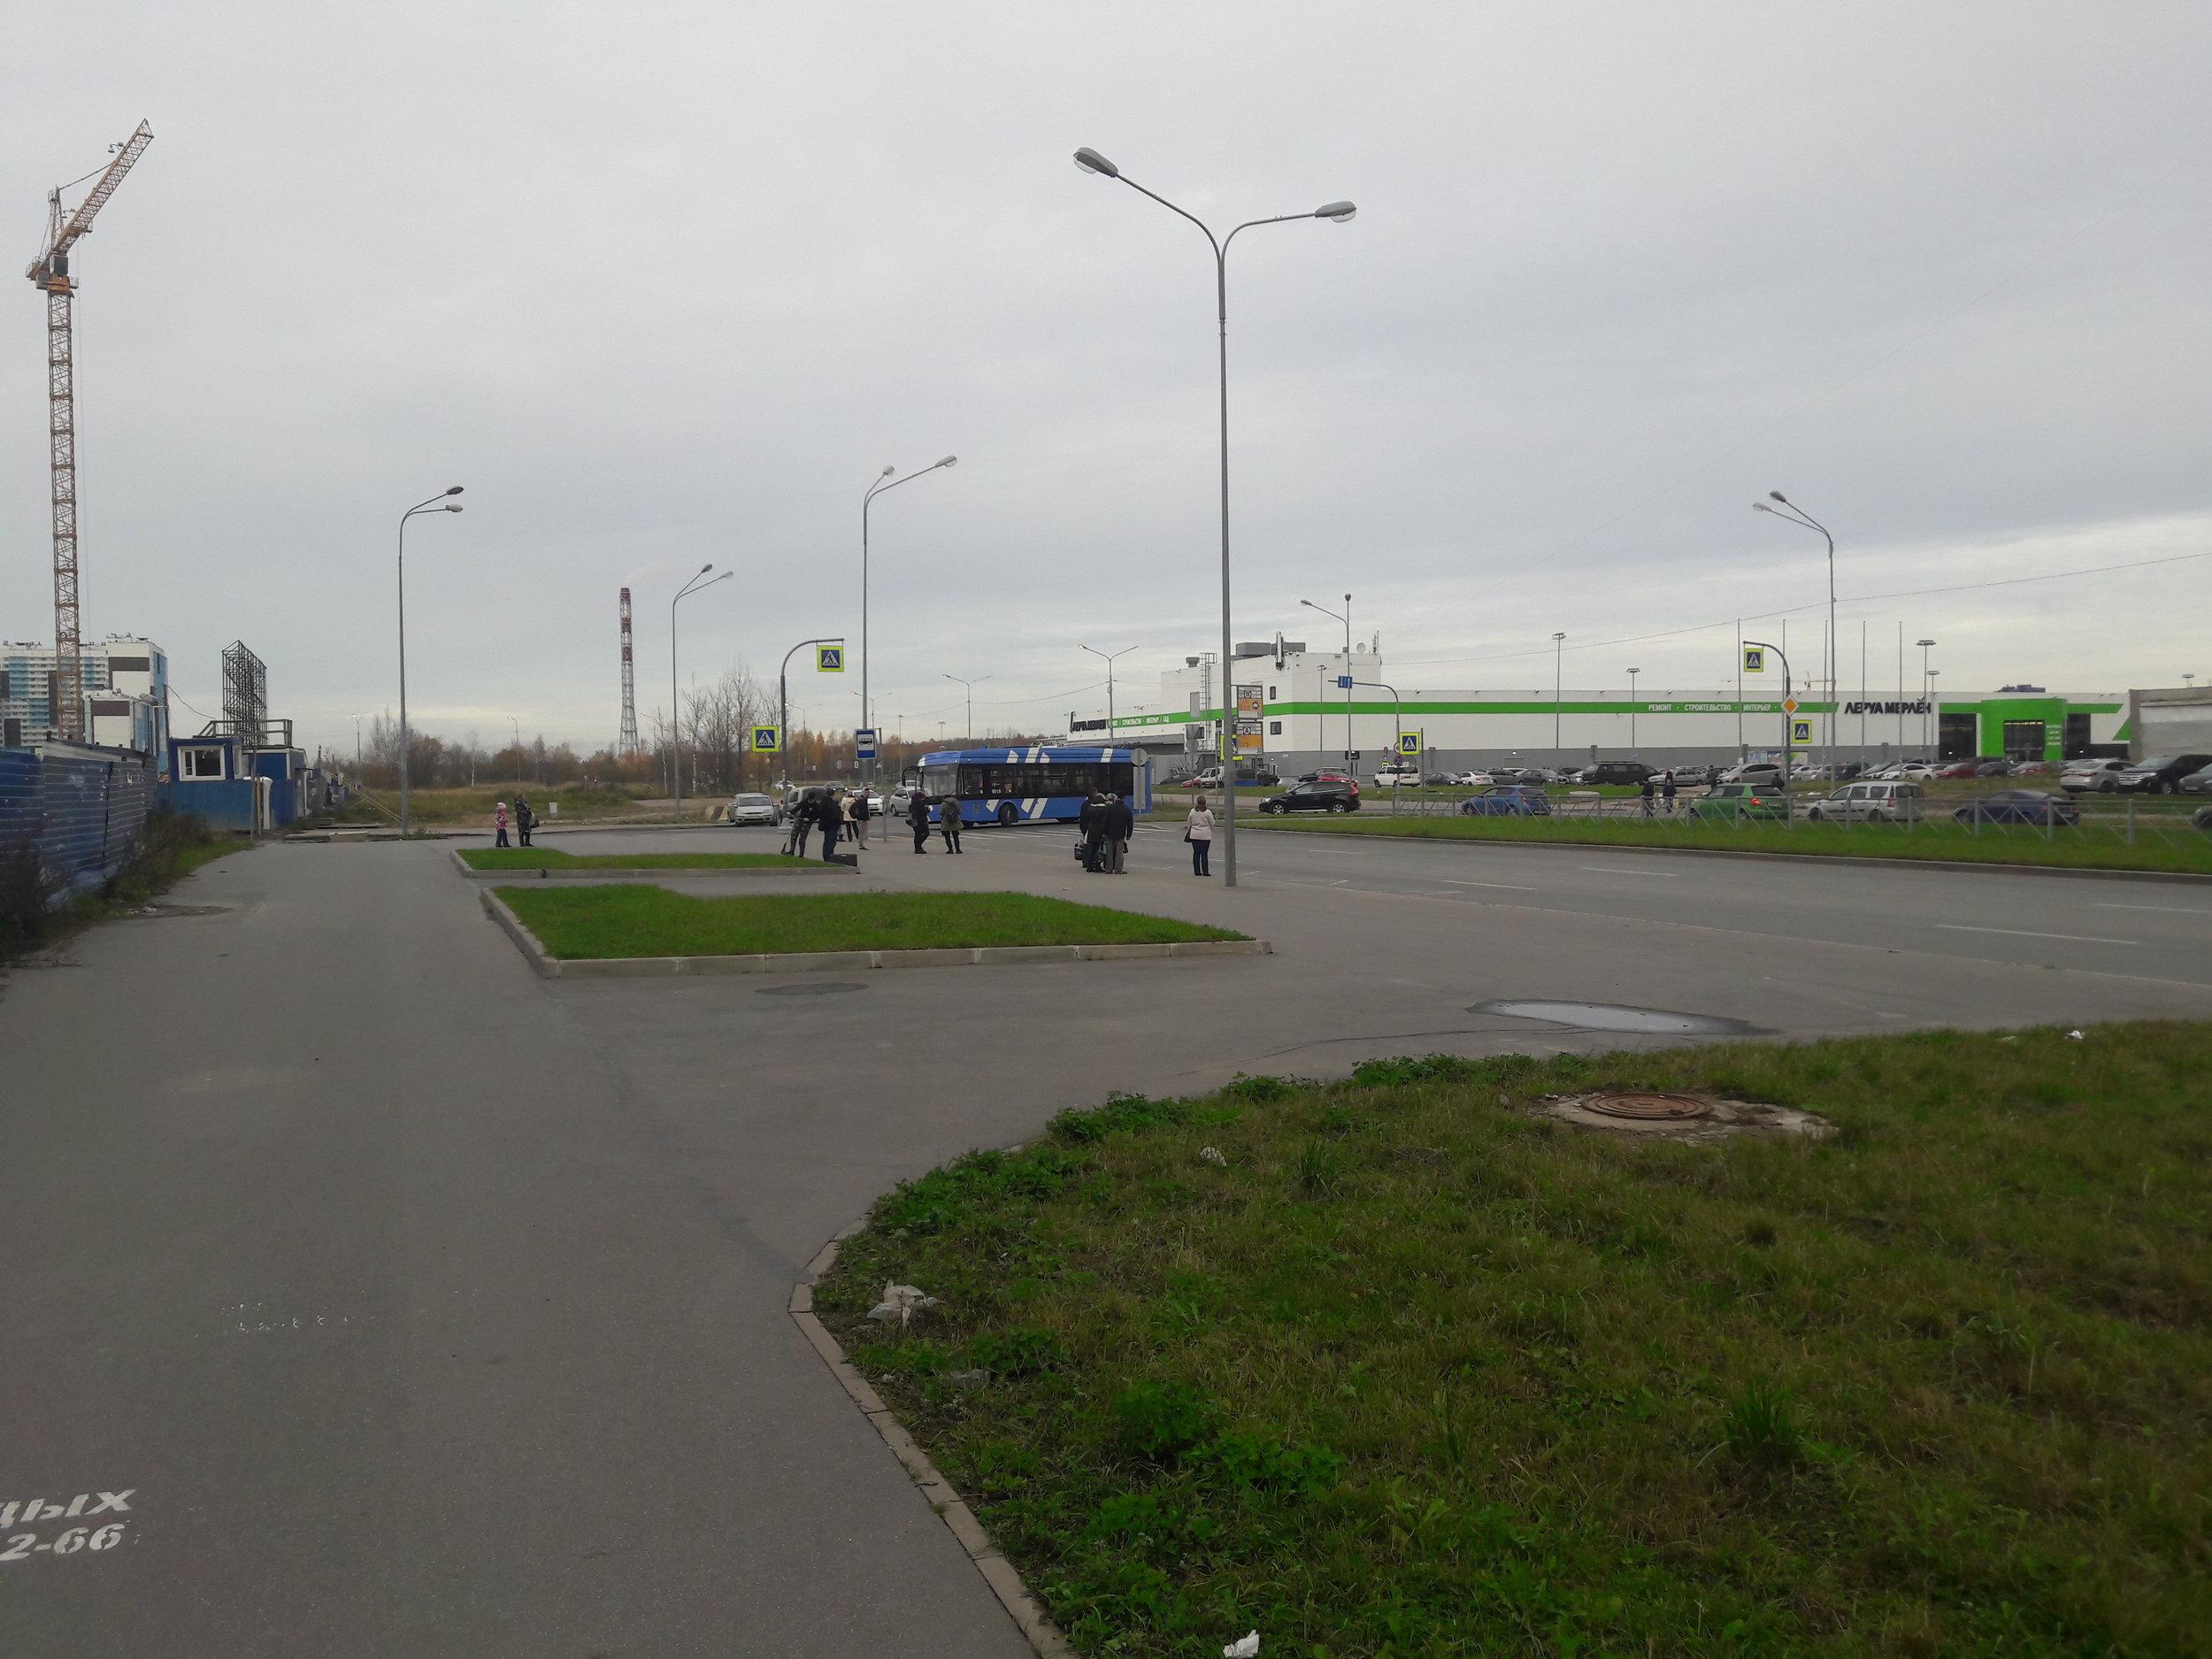 Až na konci světa aneb konečná linky č. 2 Glucharskaja ulica.